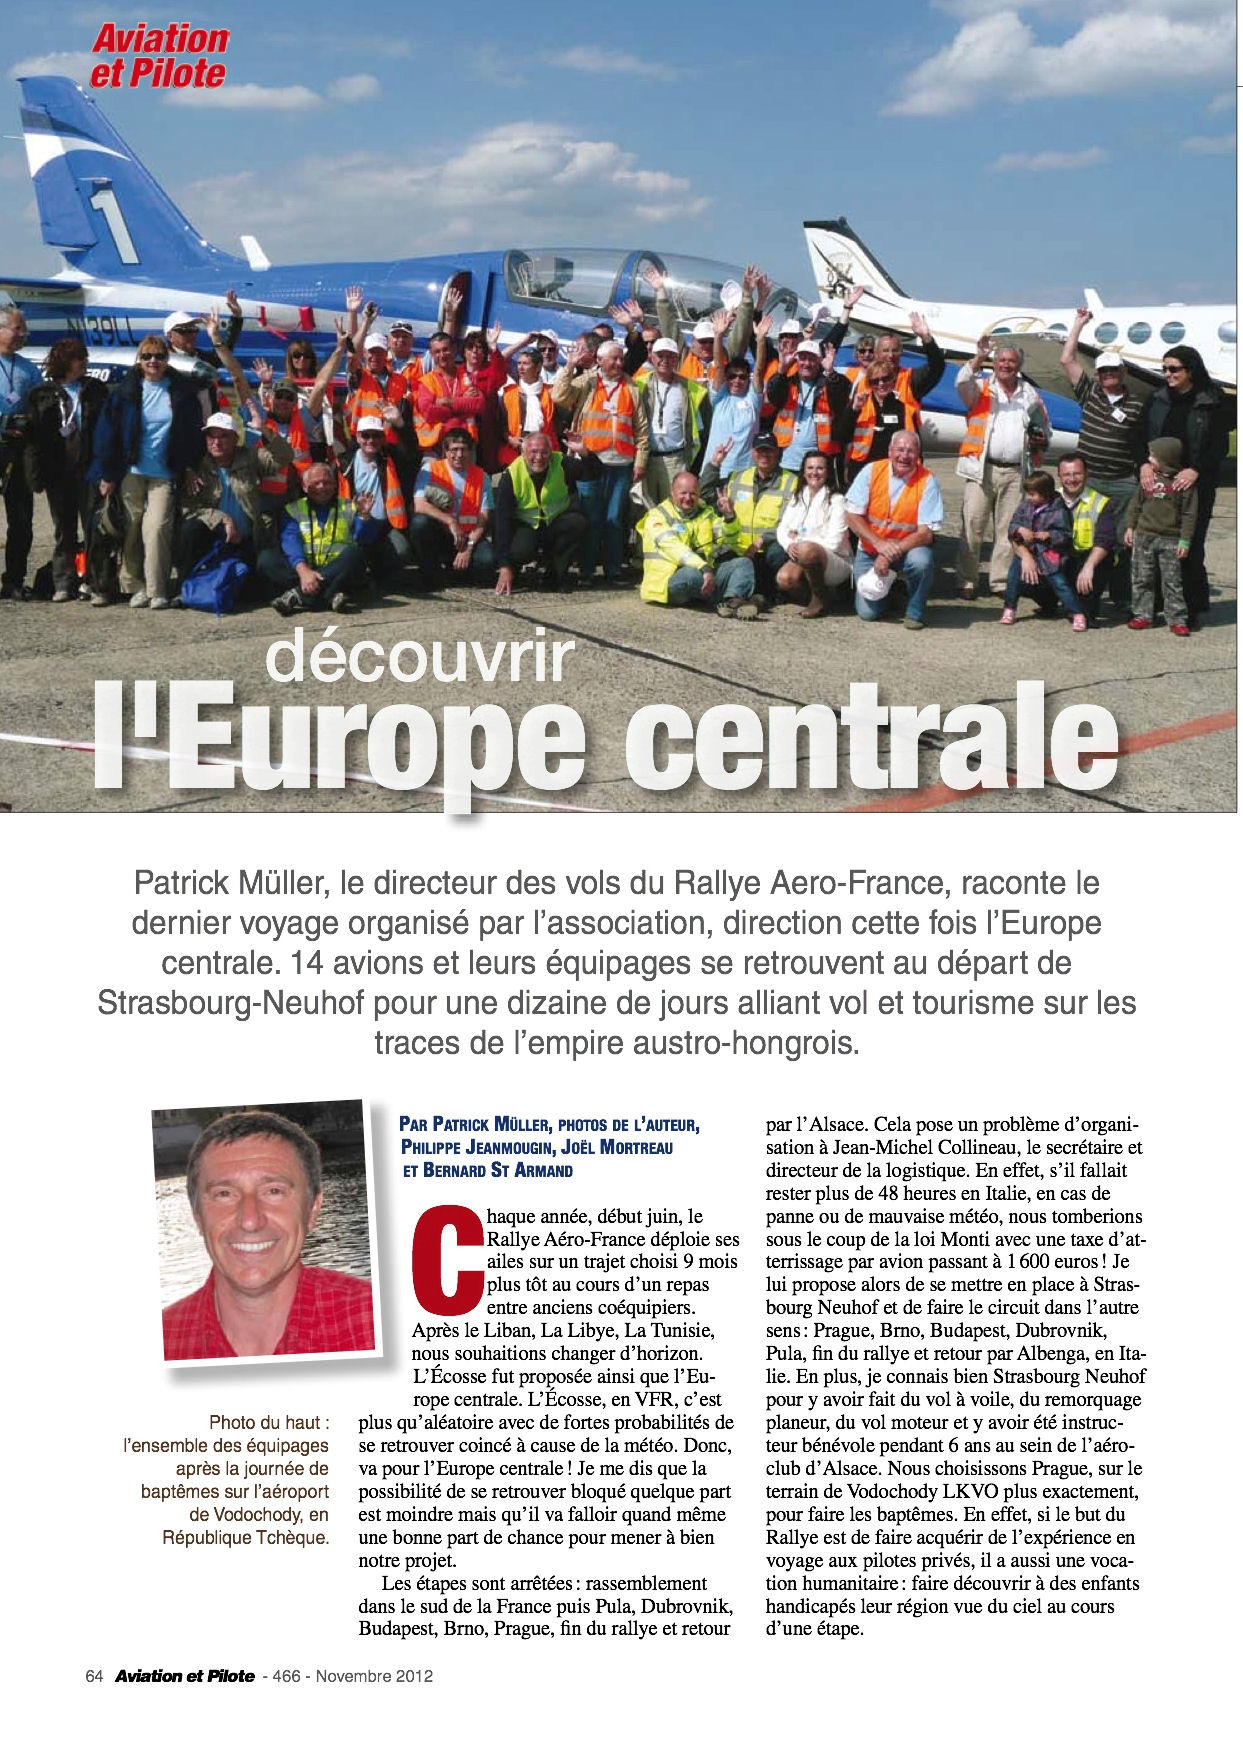 Aviation et Pilote page 1